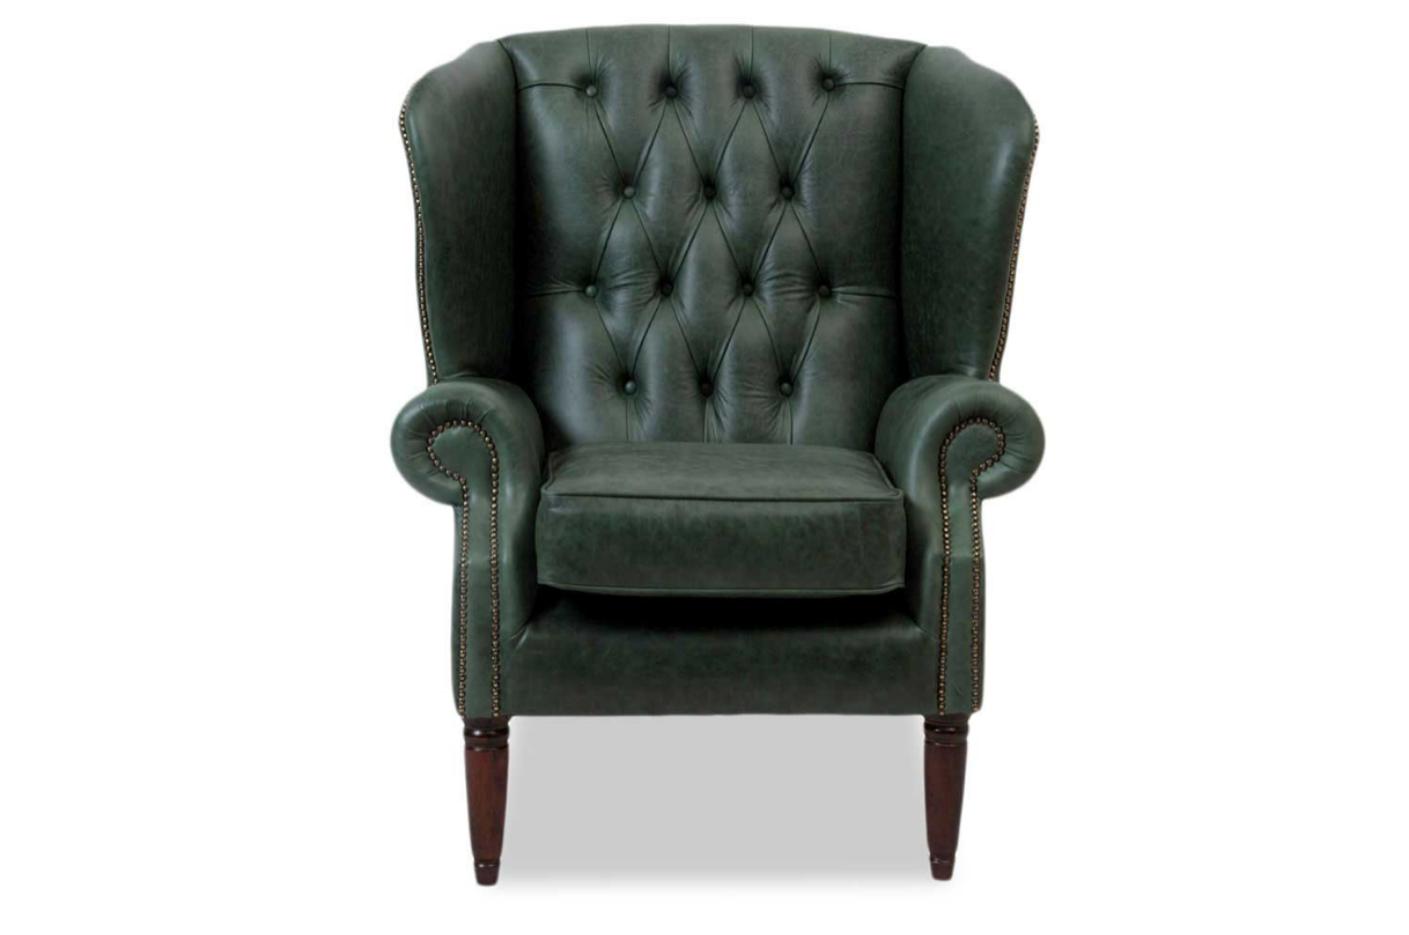 Butaca Chester Latimer Chair